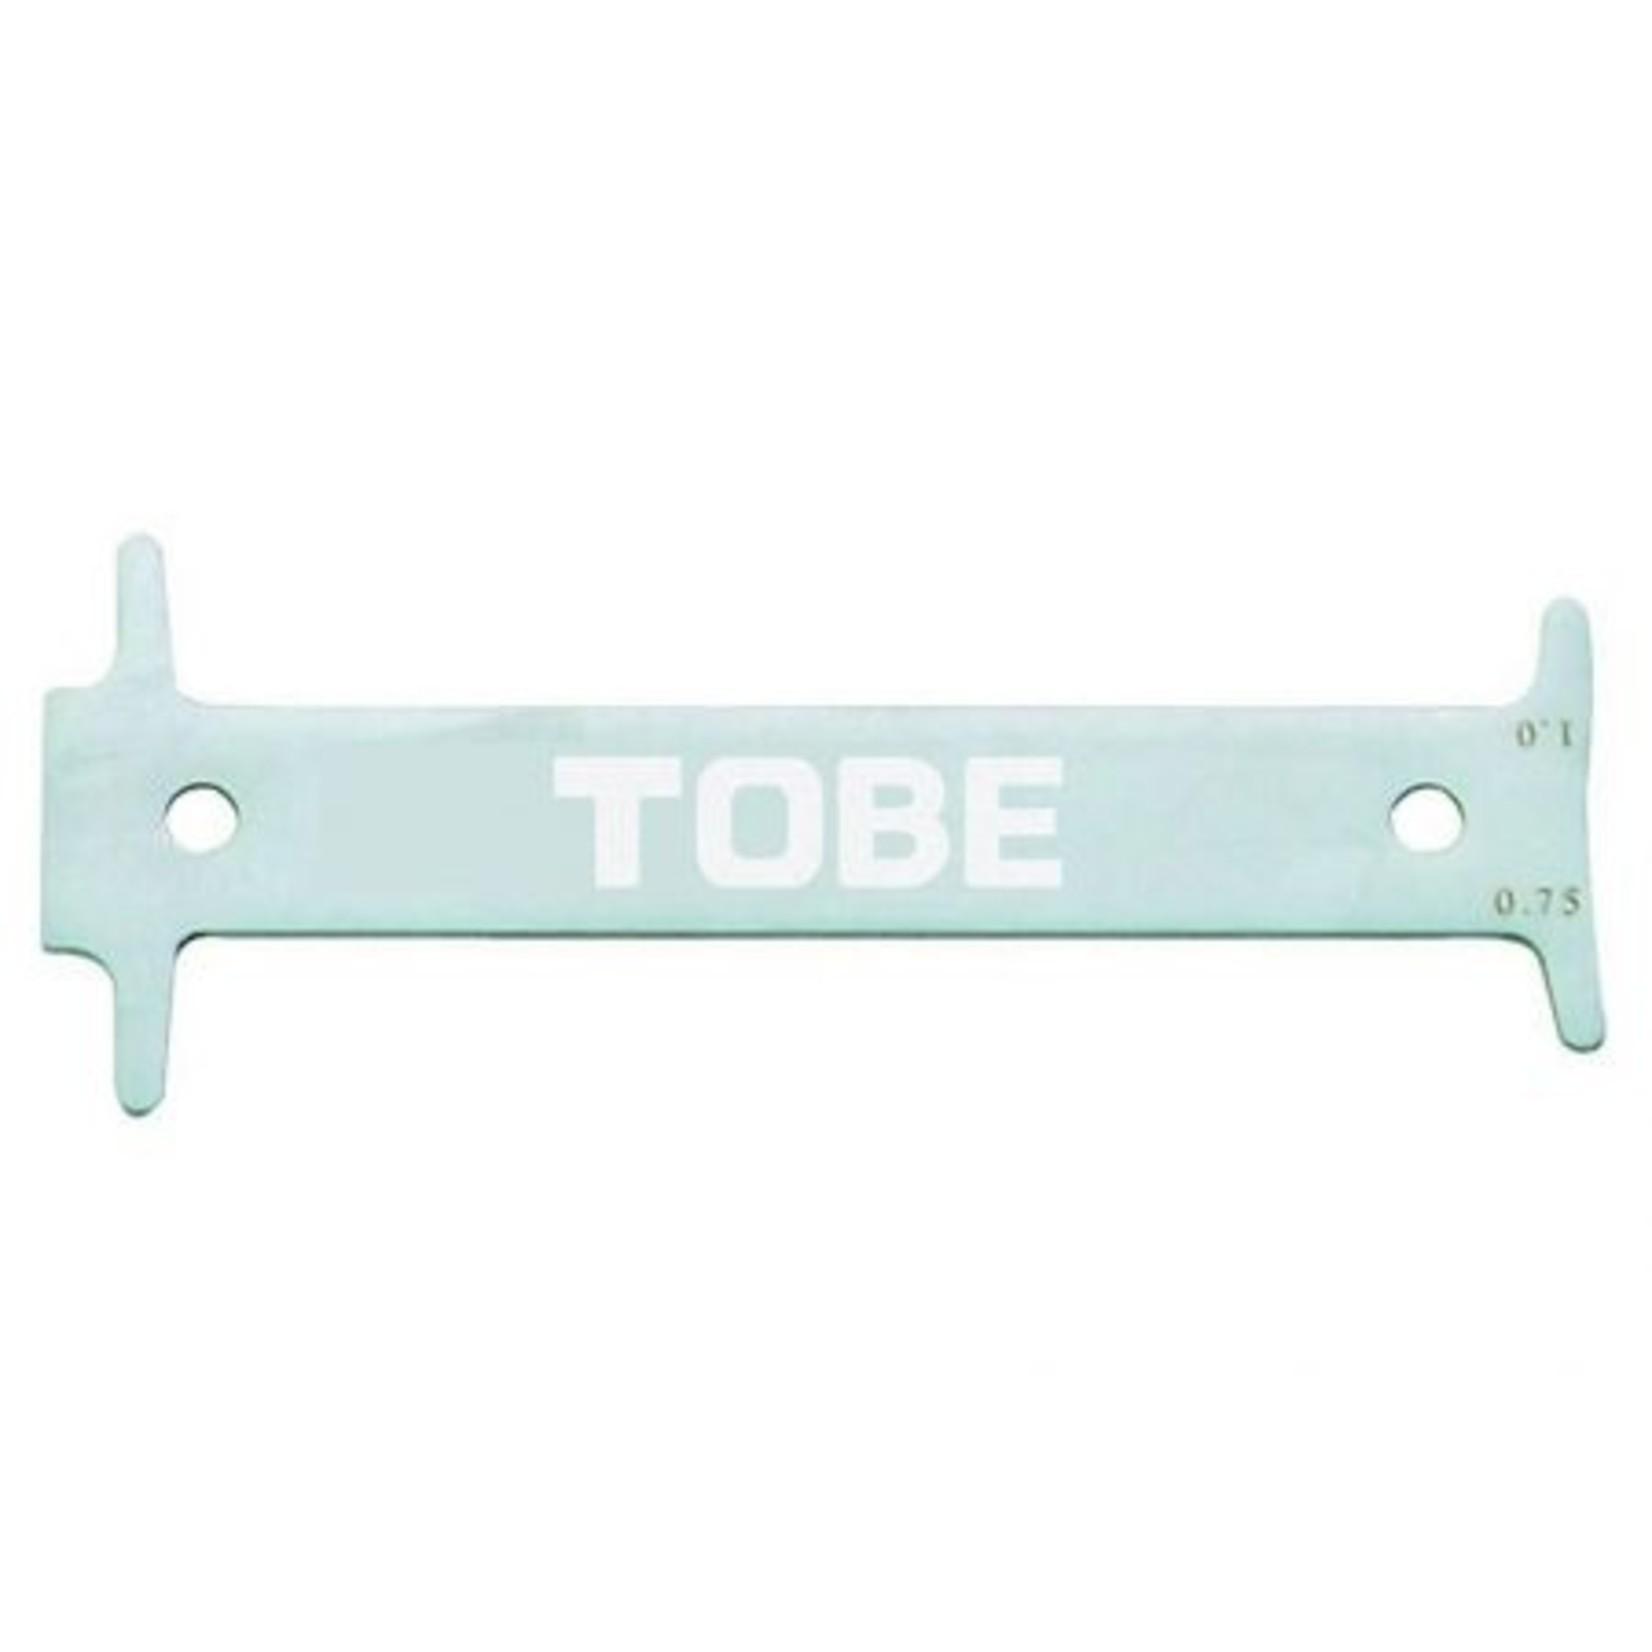 Tobe Chain Wear Checker